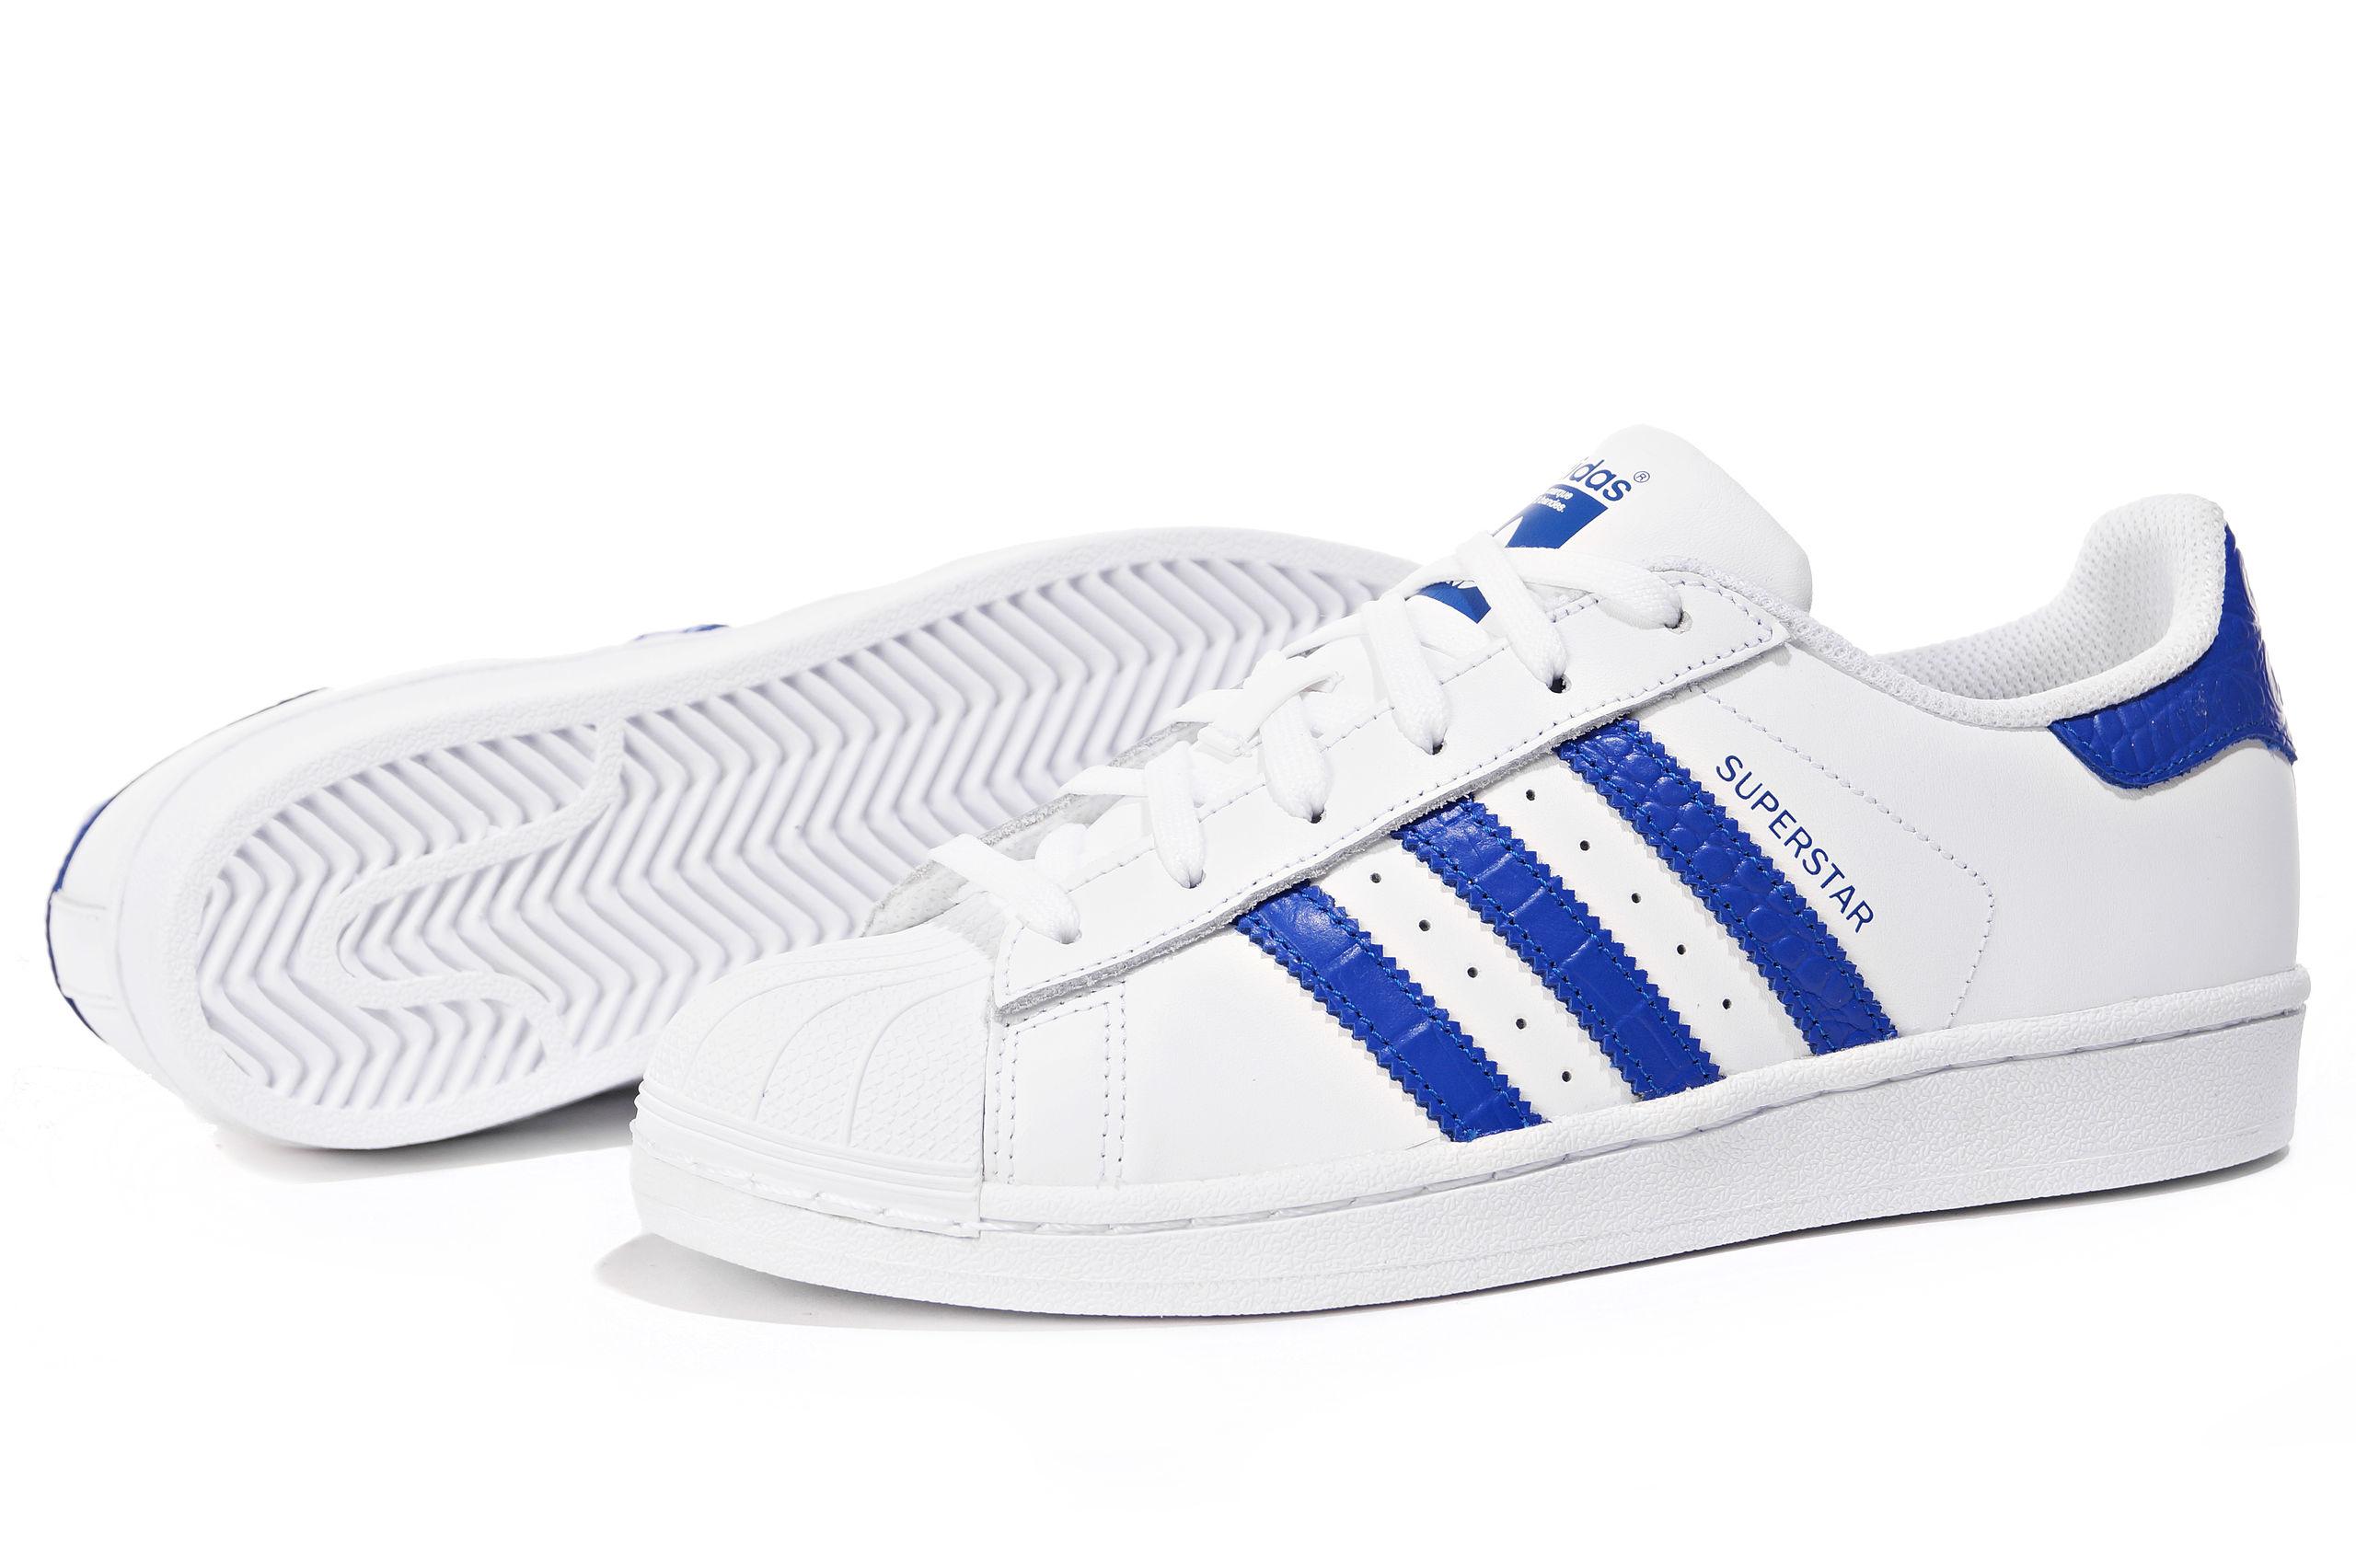 c031d5061 ... order buty adidas superstar j bz0363 originals r. 37 1 3 09c16 20b14